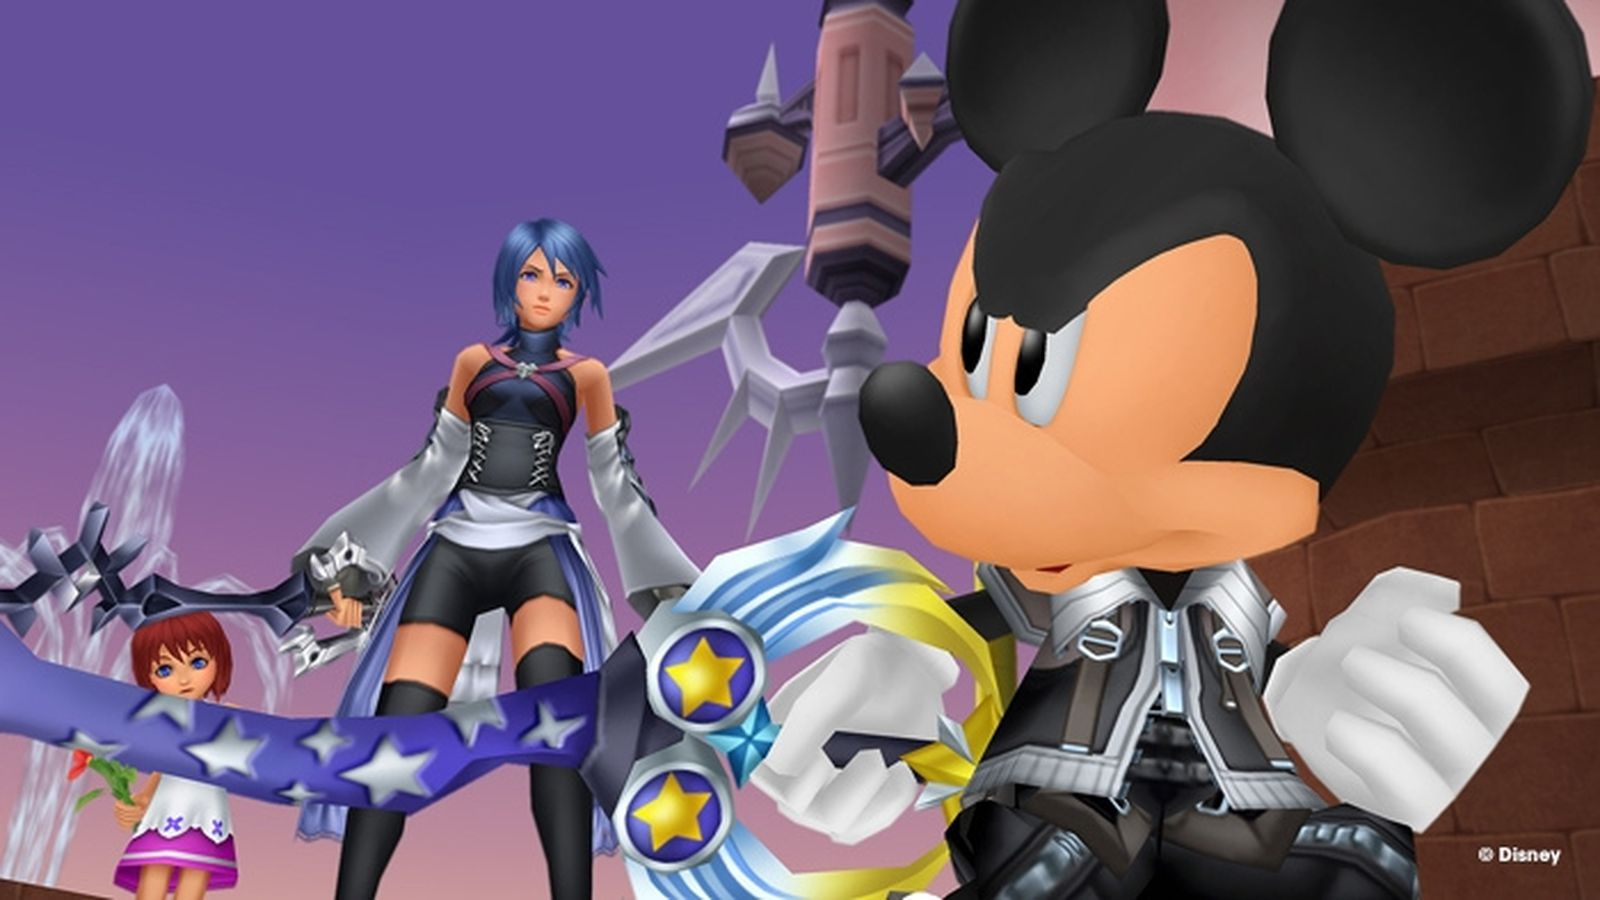 Kingdom Hearts III: The Novel, Vol. 2 Seven New Hearts is